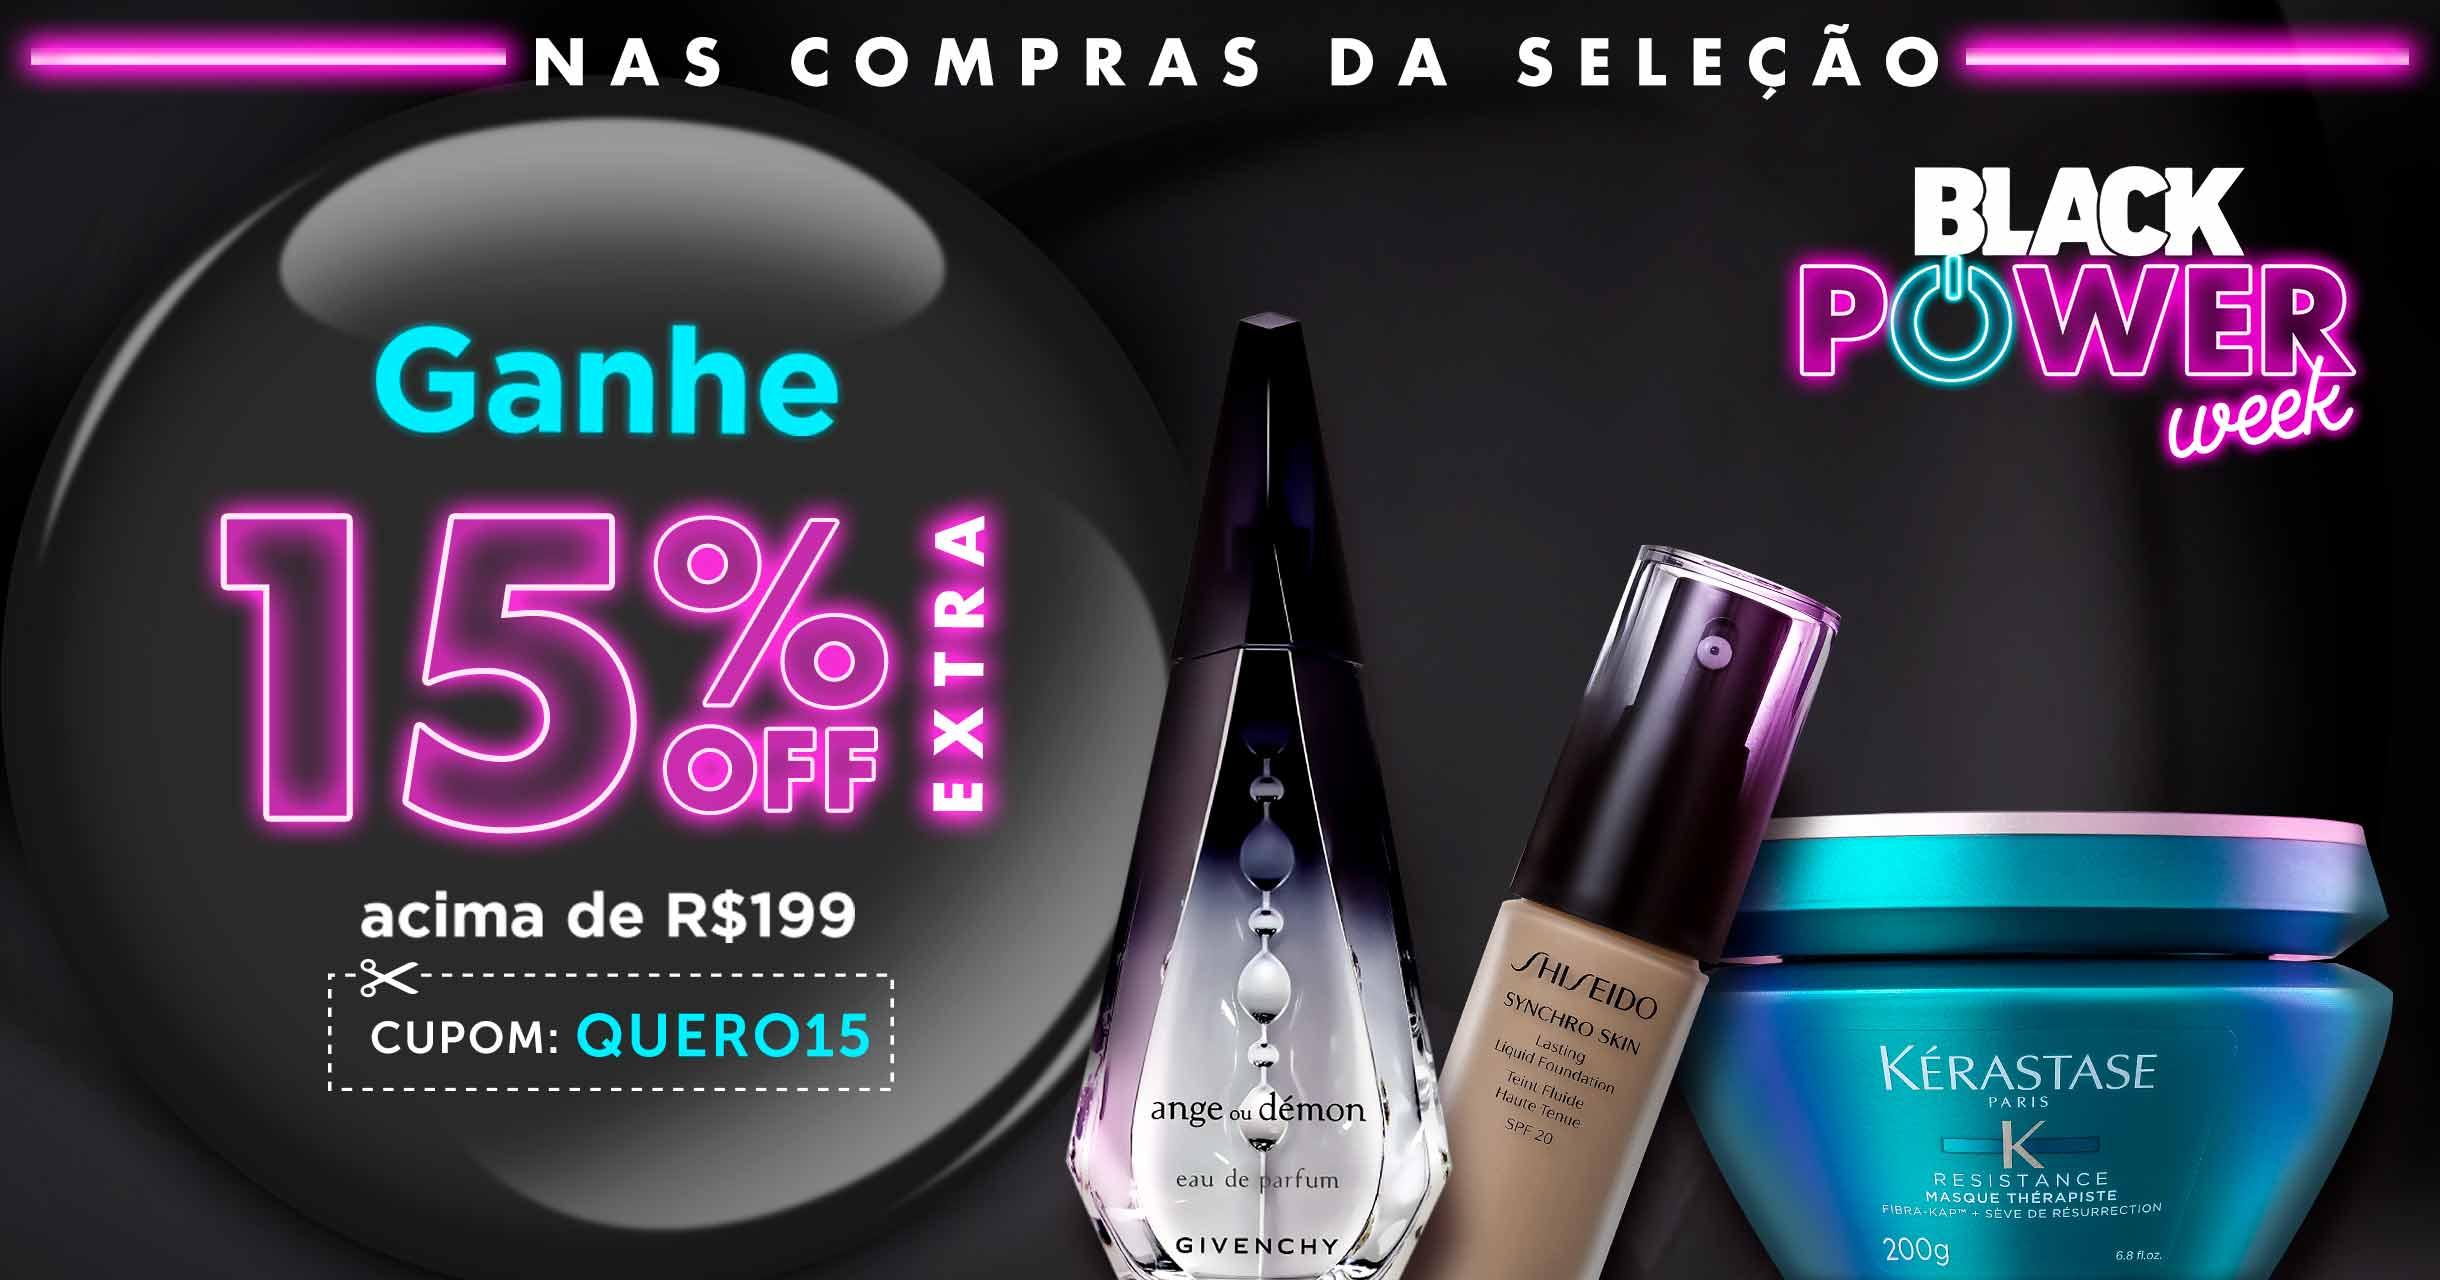 fd11cf8d1 Tudo para Cabelos, Maquiagem, Perfumes e Pele | Beleza na Web